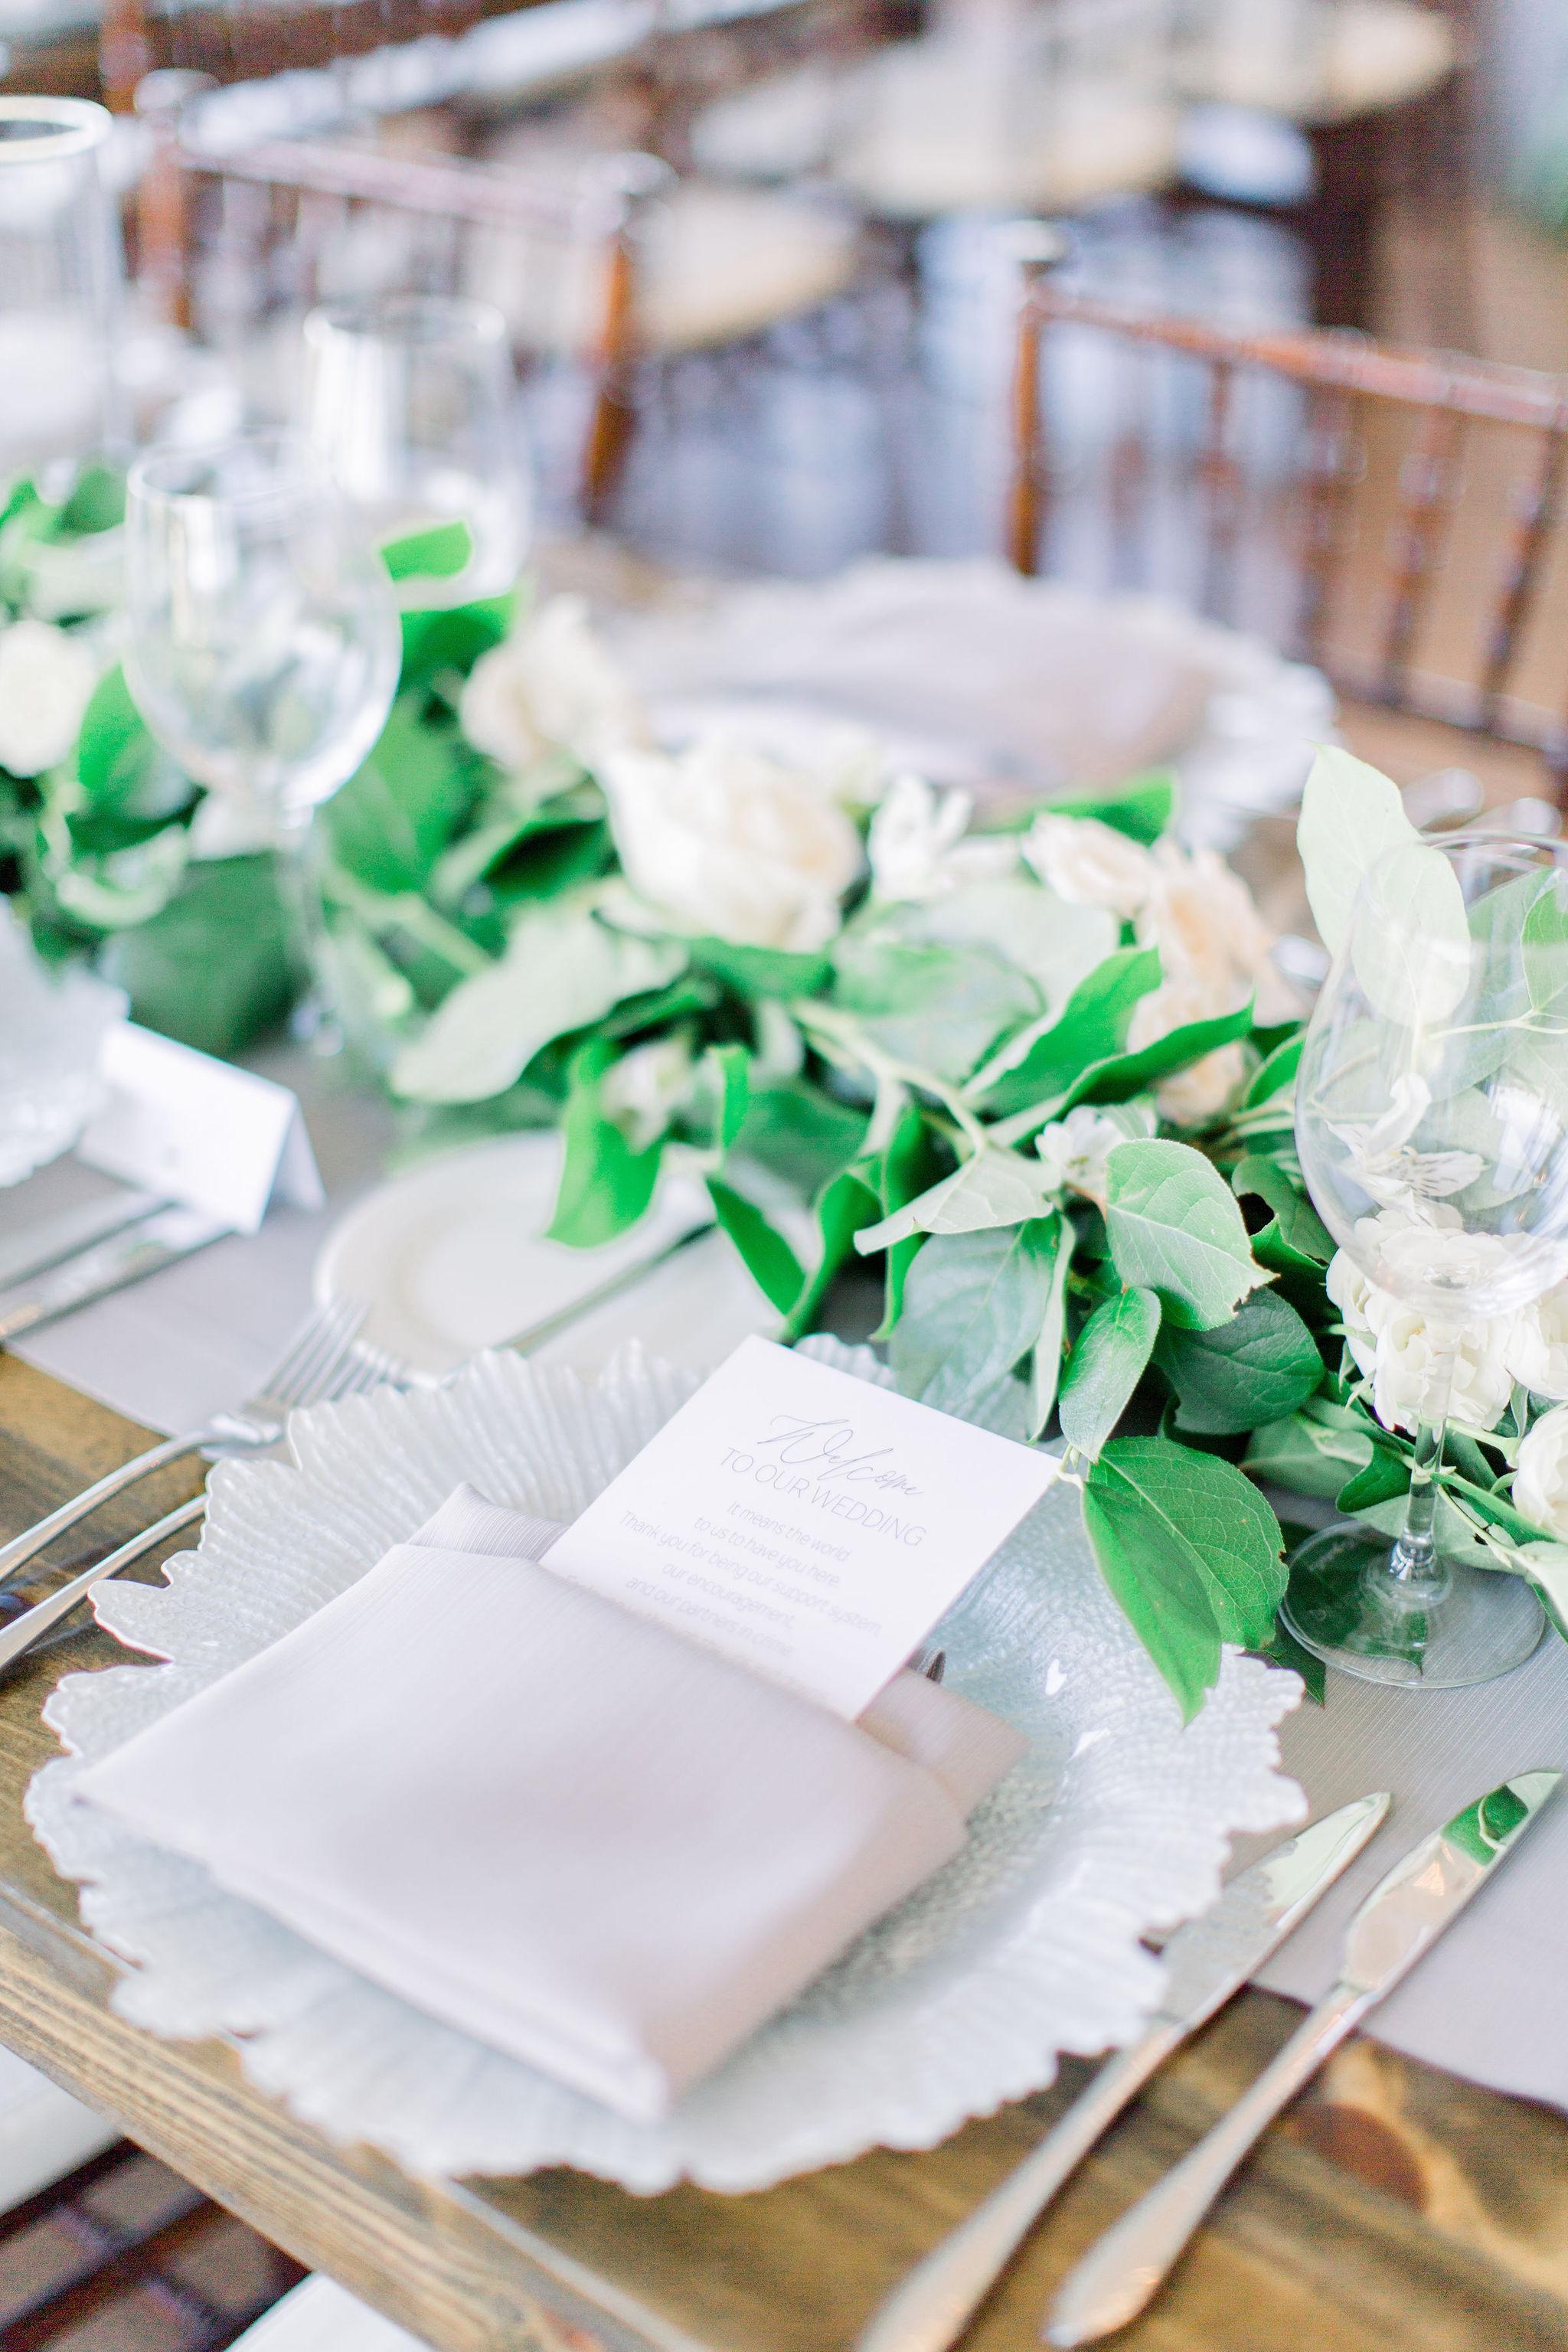 sydney-bodi-wedding-budget-friendly-blooms-carmel-mountain-white-flowers-7.jpg